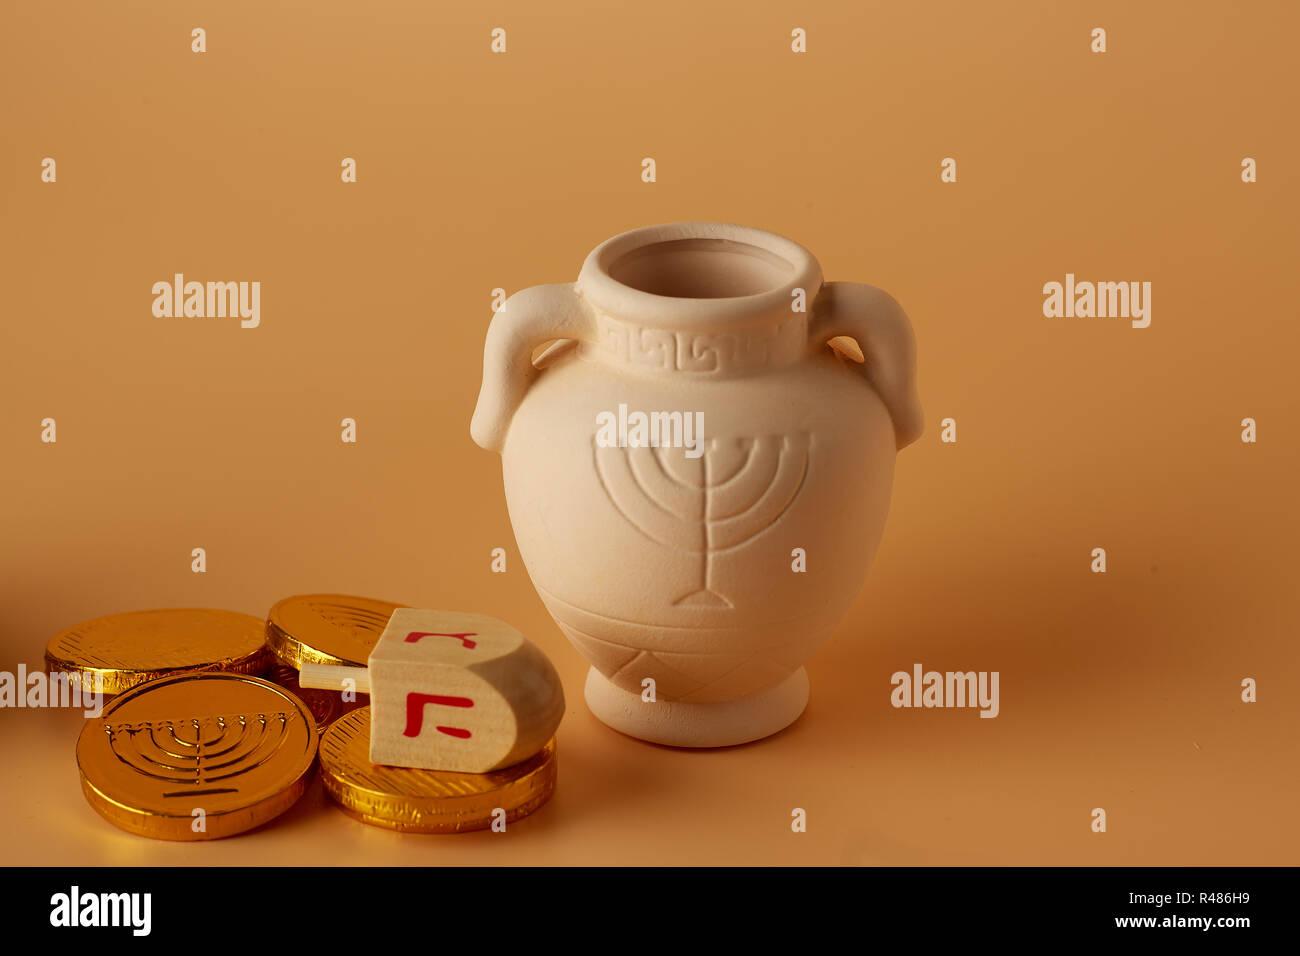 ah gelt or money or coins with Hanukkah dreidel and a Hanukkah clay jug . Translation: Happy Holidays - Stock Image